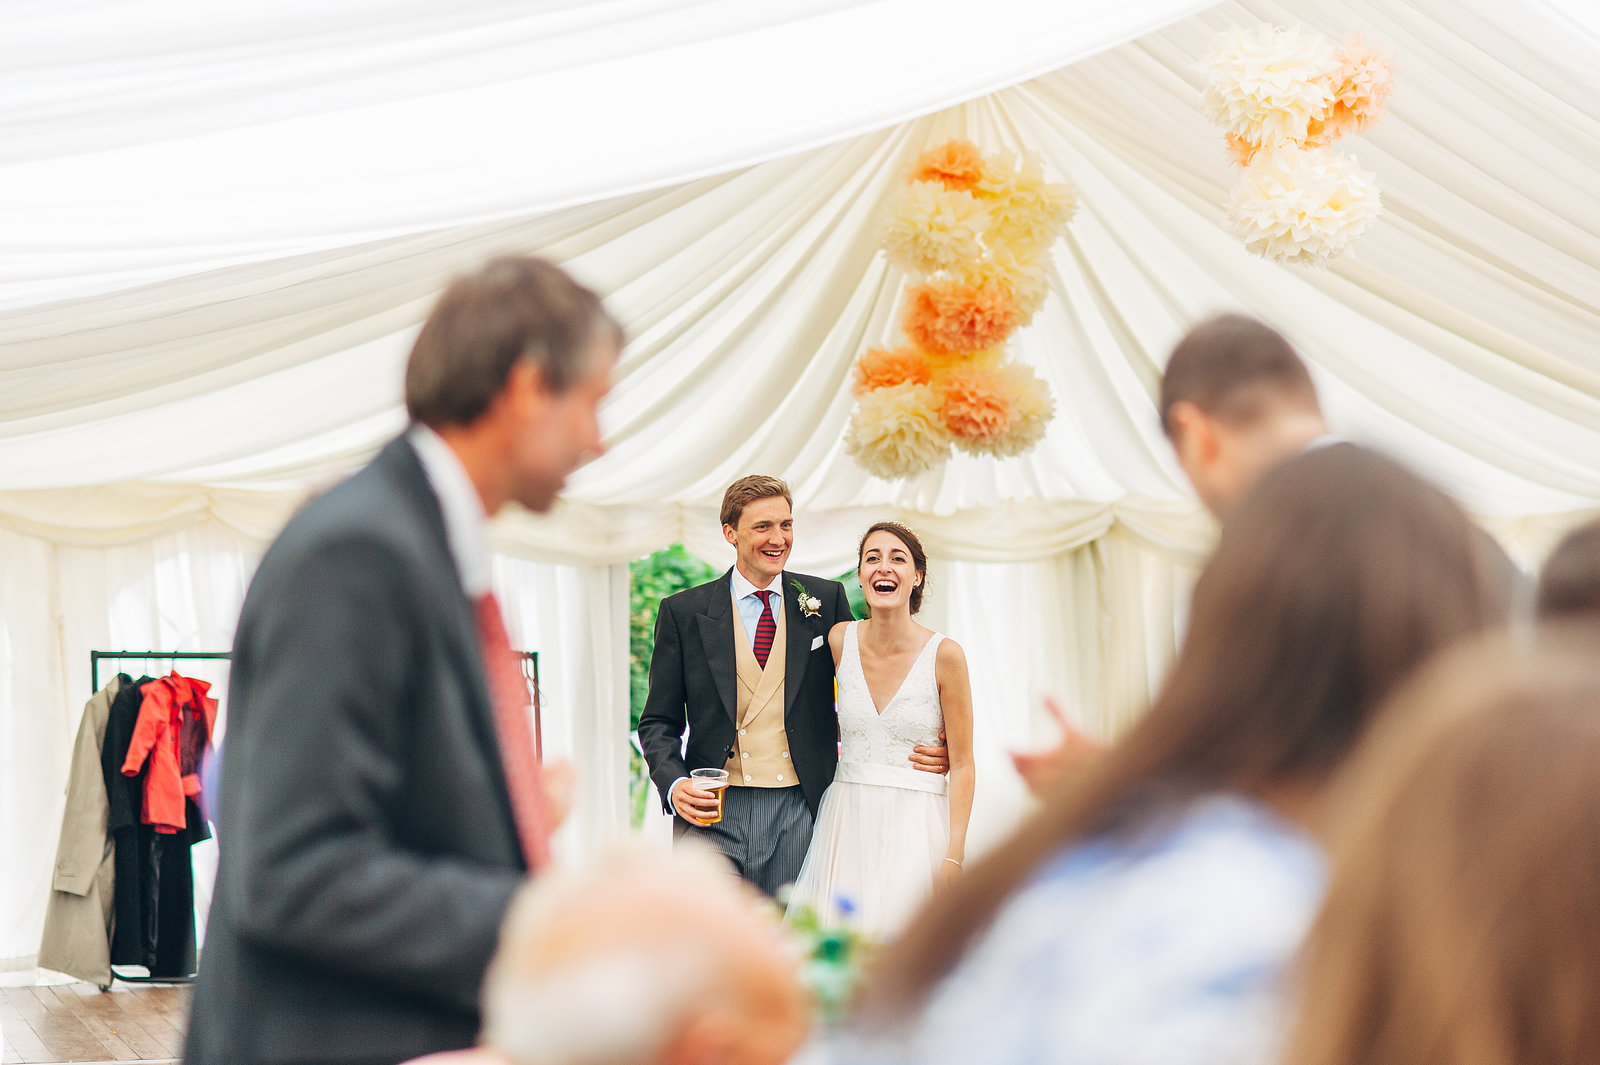 Alastair & Katherine's Wedding, July 2015